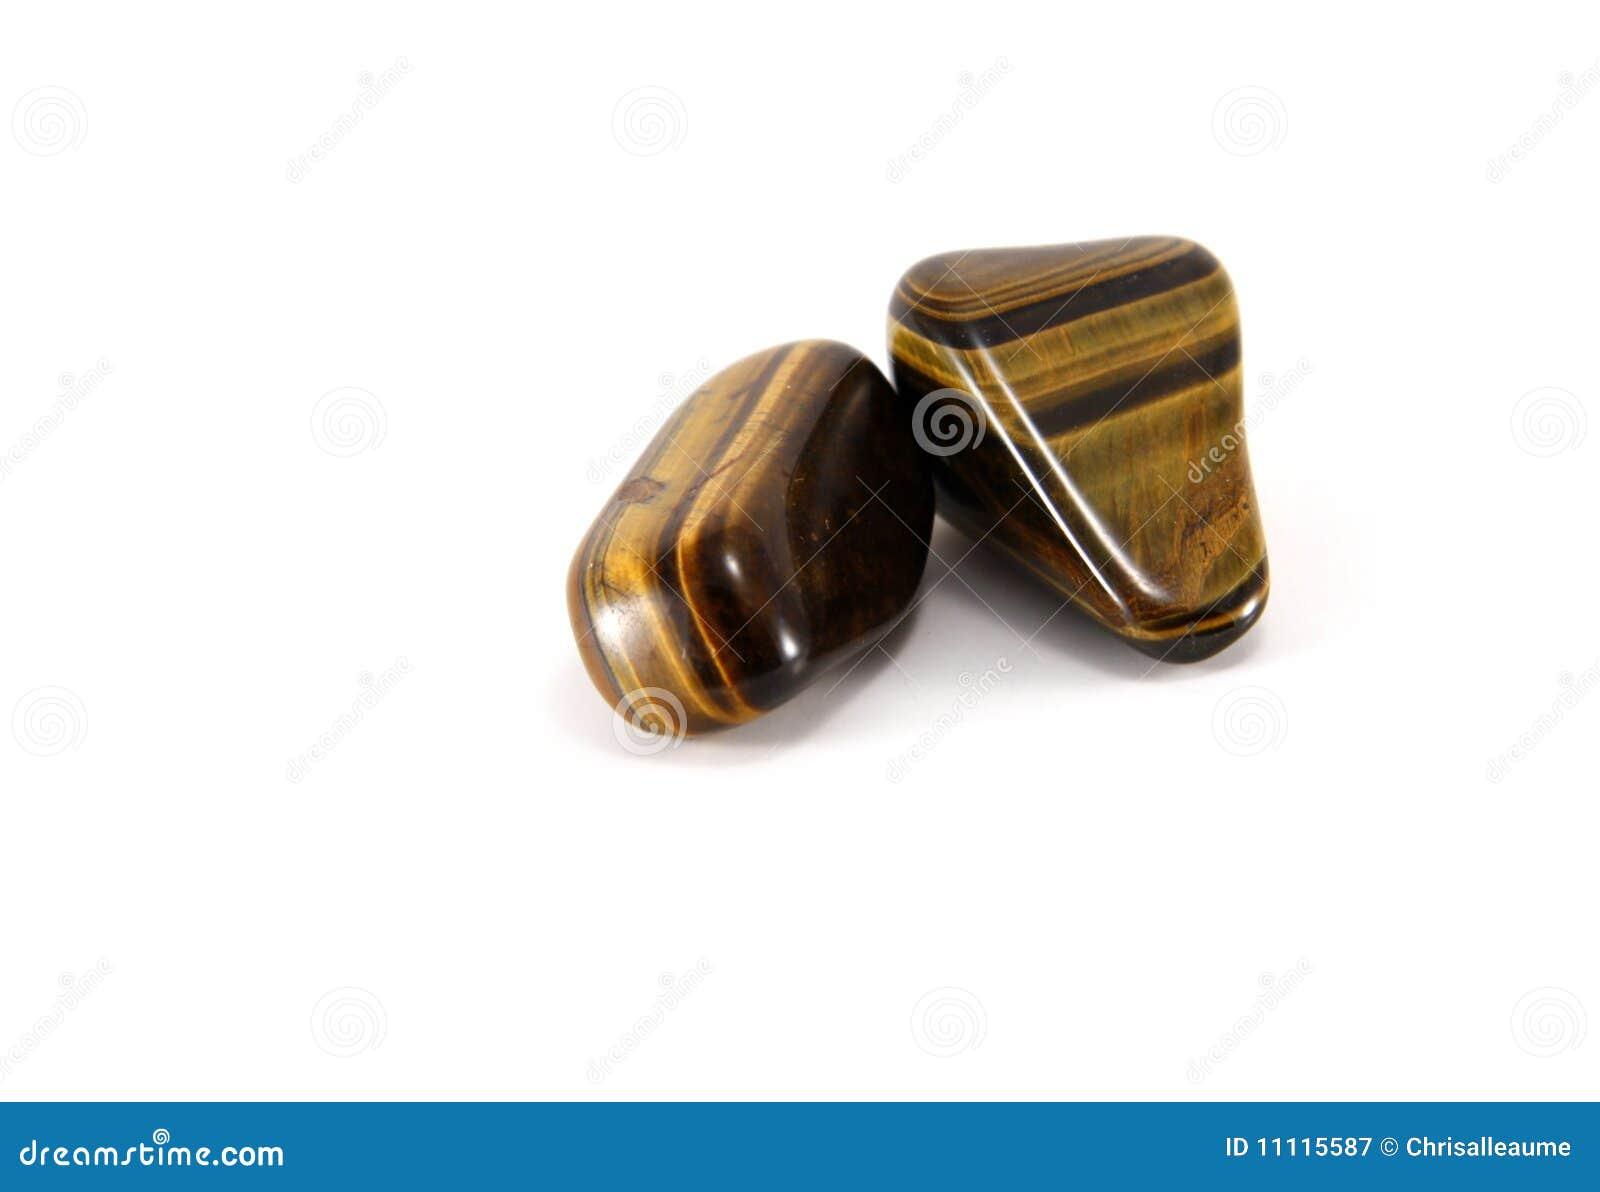 Tigers eye gem stones